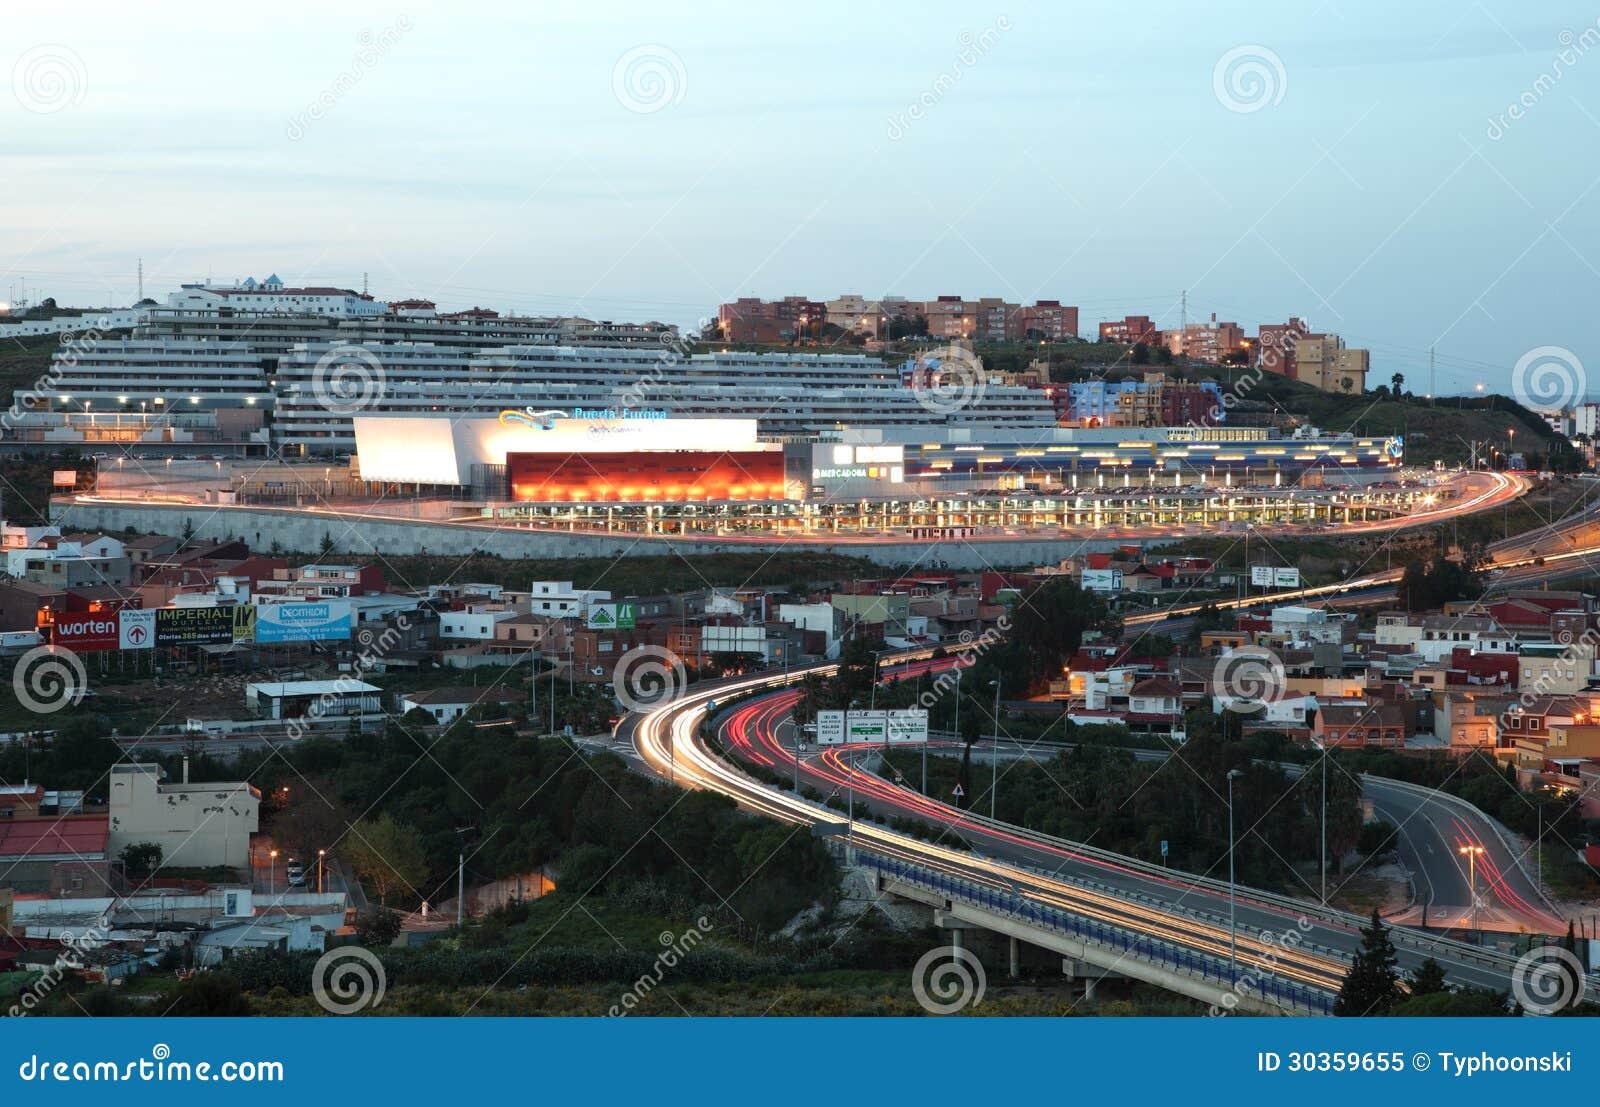 Puerta de europa center algeciras editorial image image - Puerta europa almeria ...